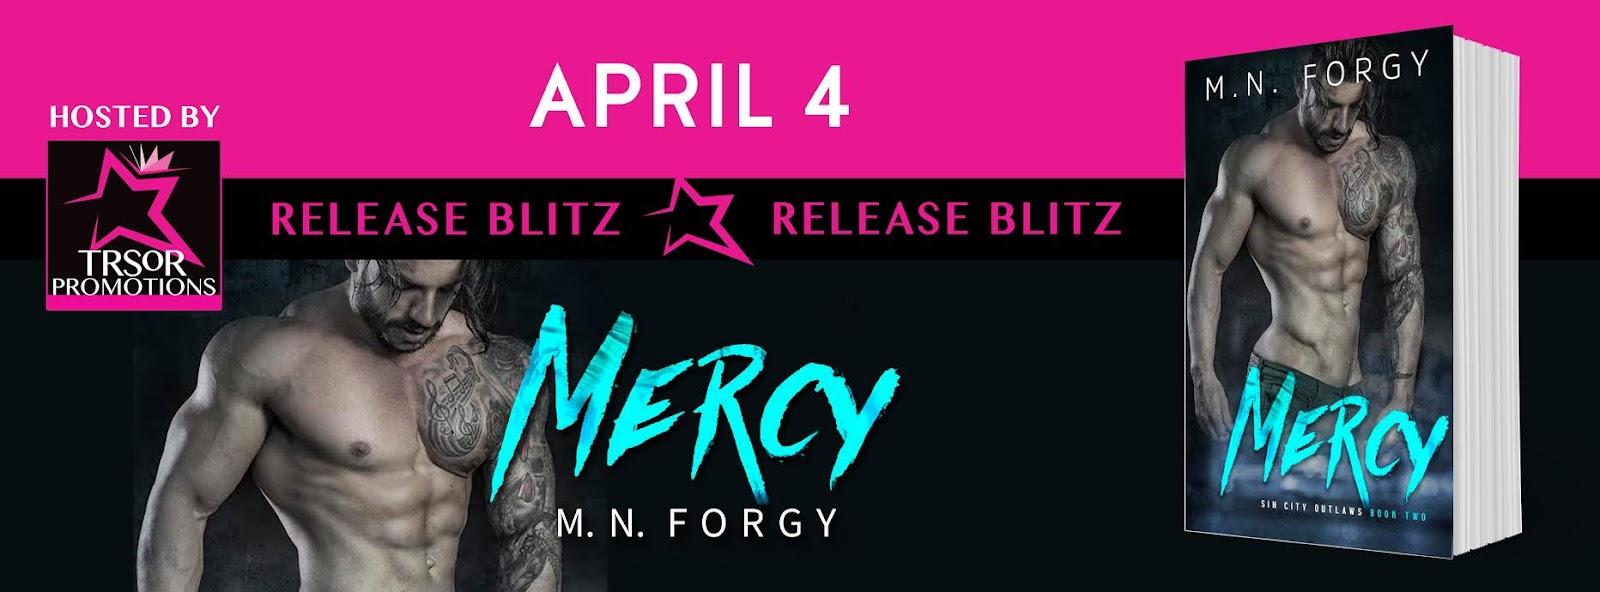 mercy release blitz.jpg